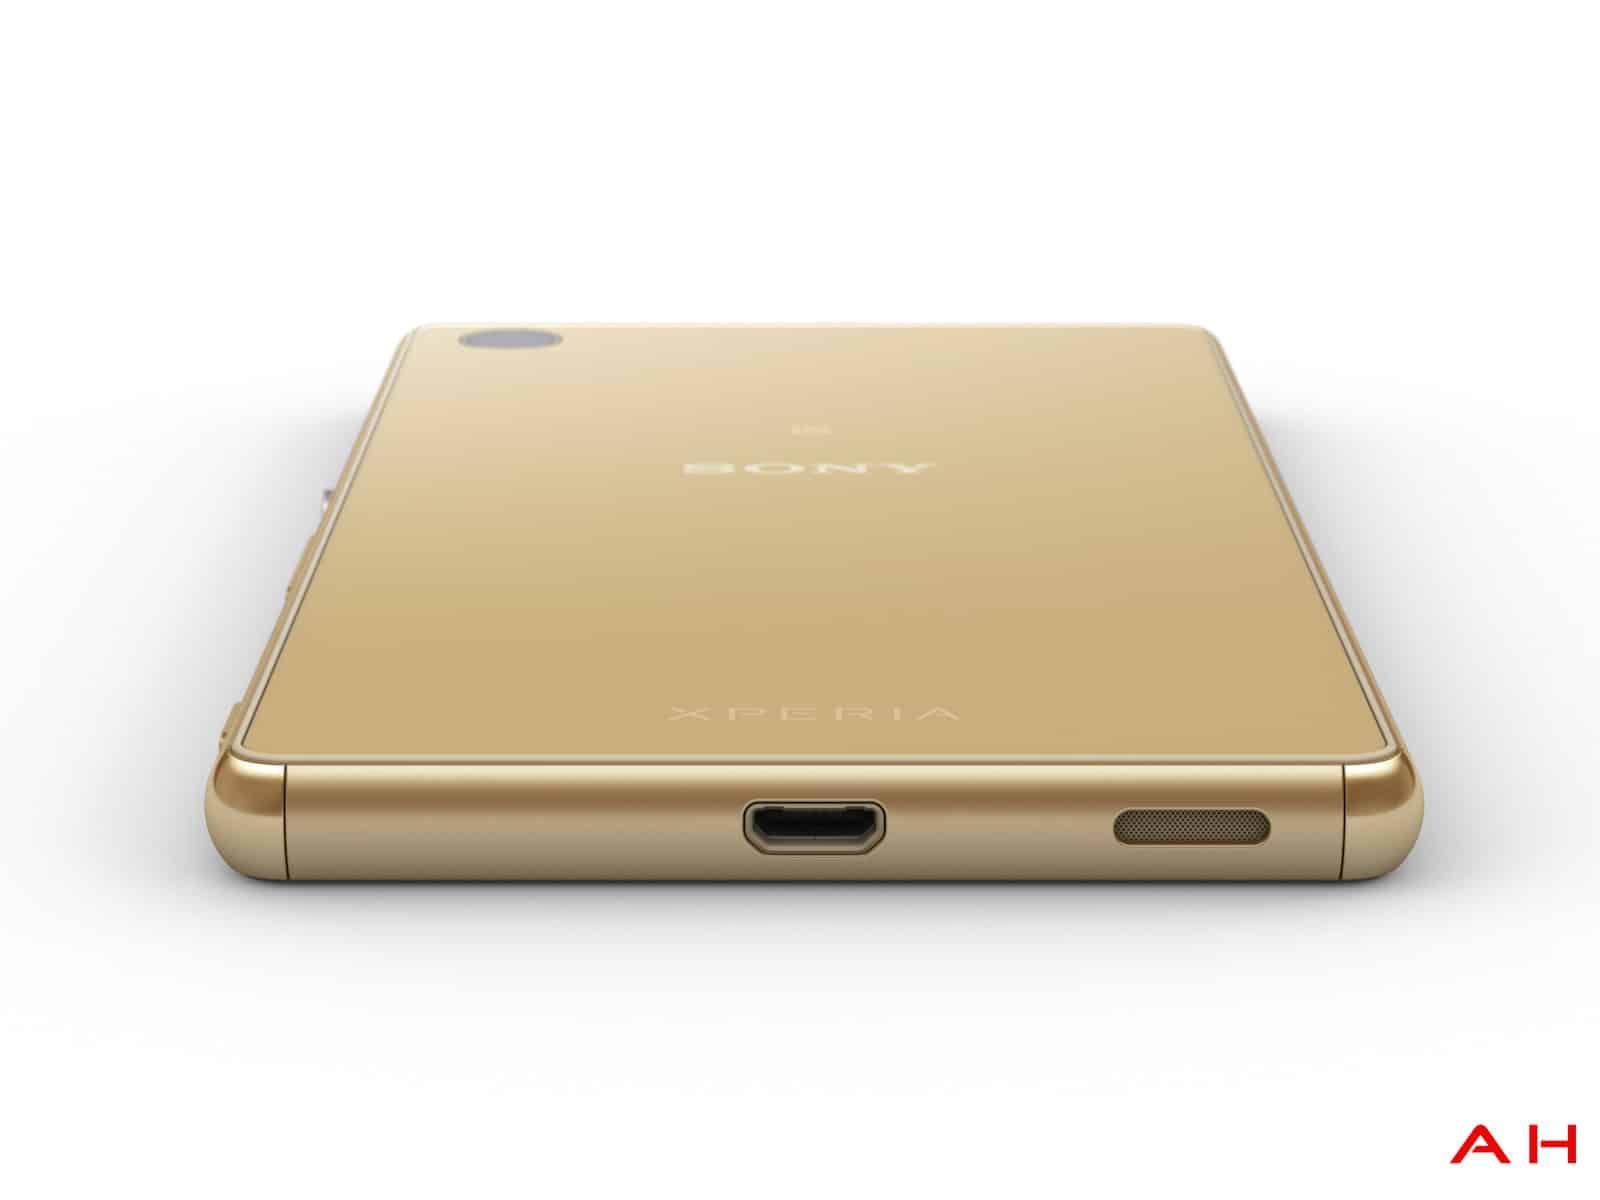 AH Sony Xperia M5 Press Images 6